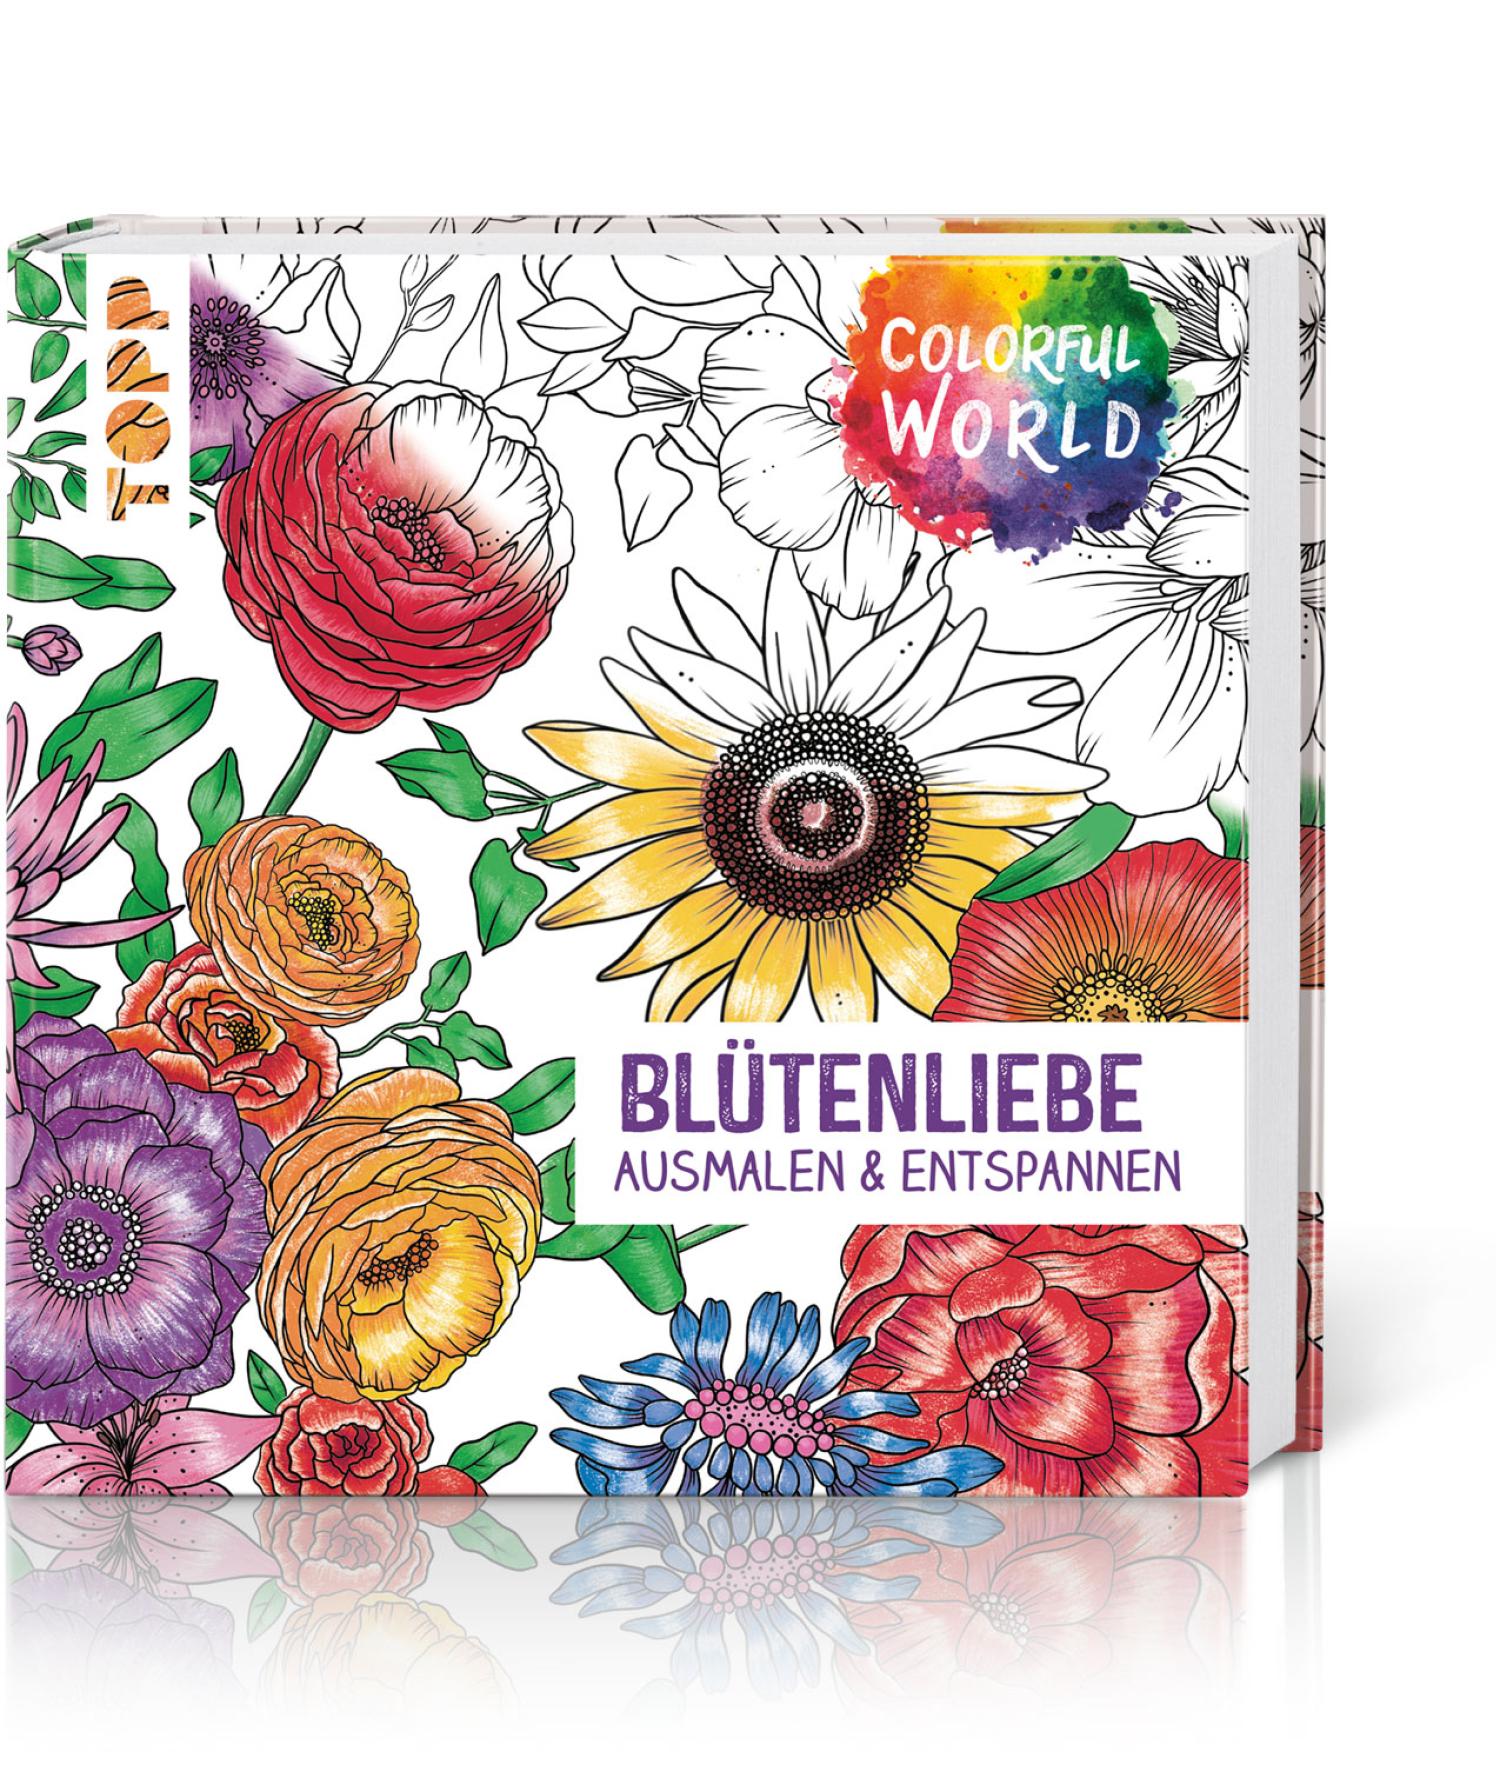 Colorful World – Blütenliebe, Produktbild 1